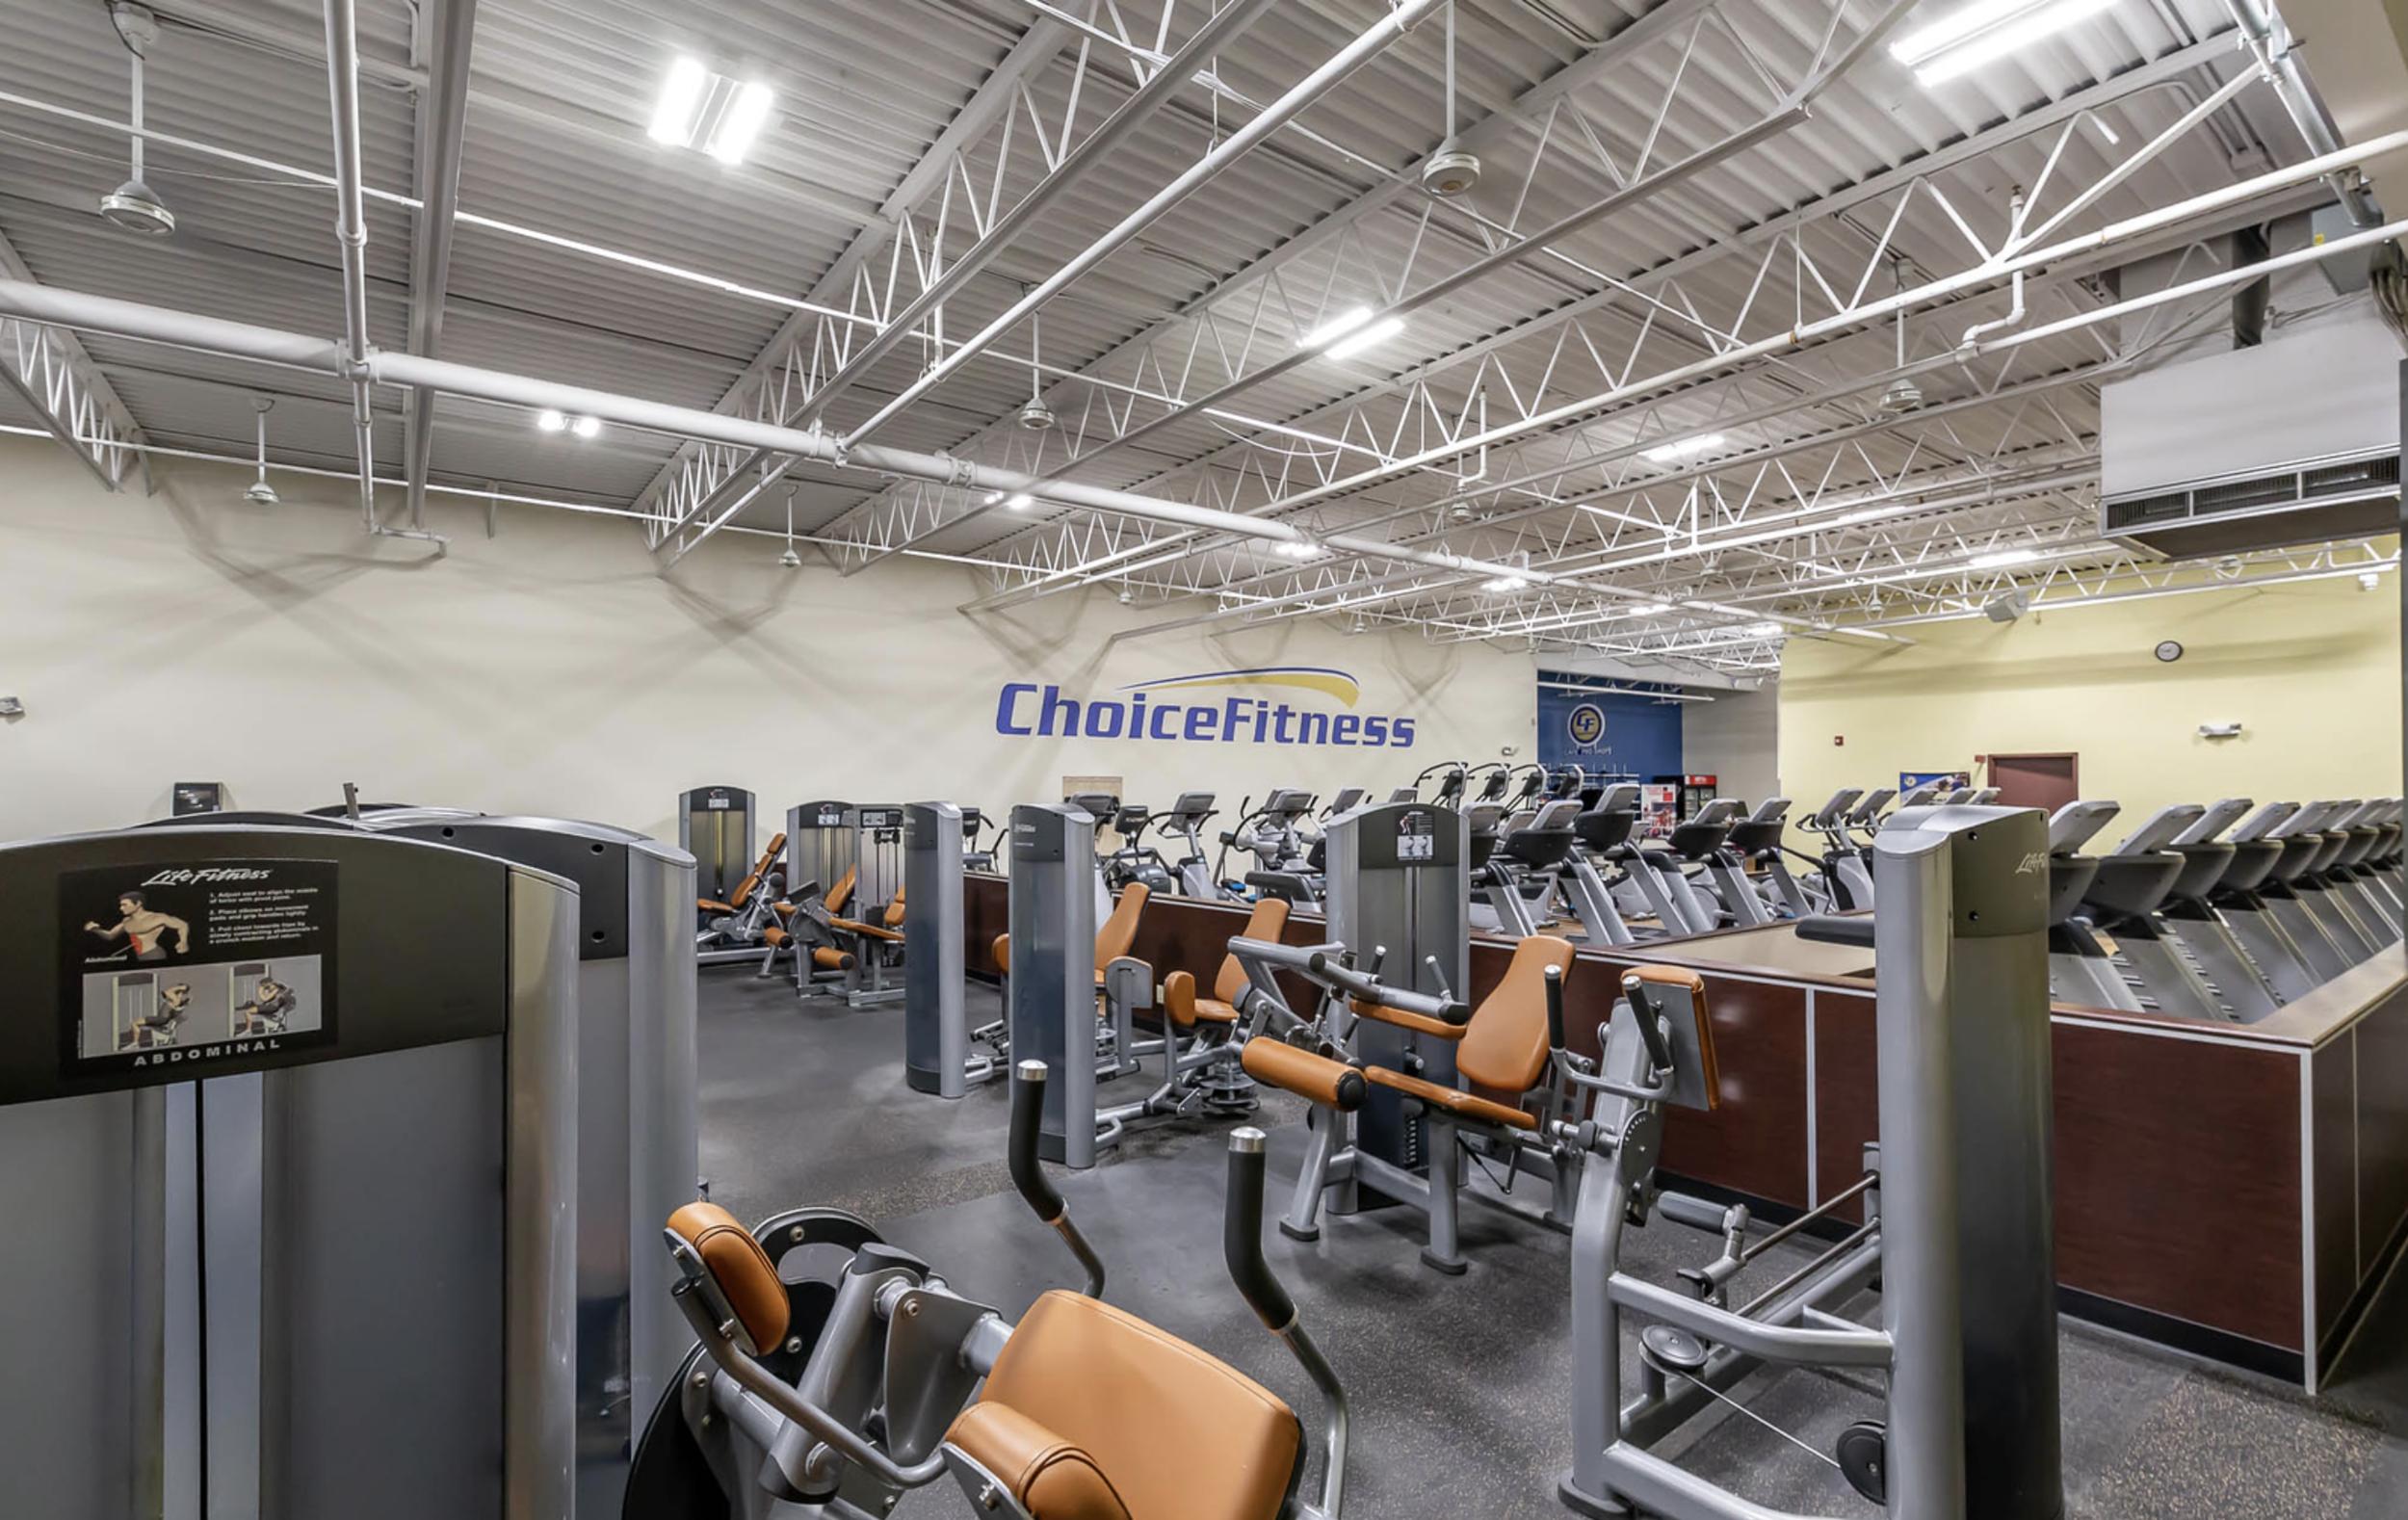 Choice Fitness